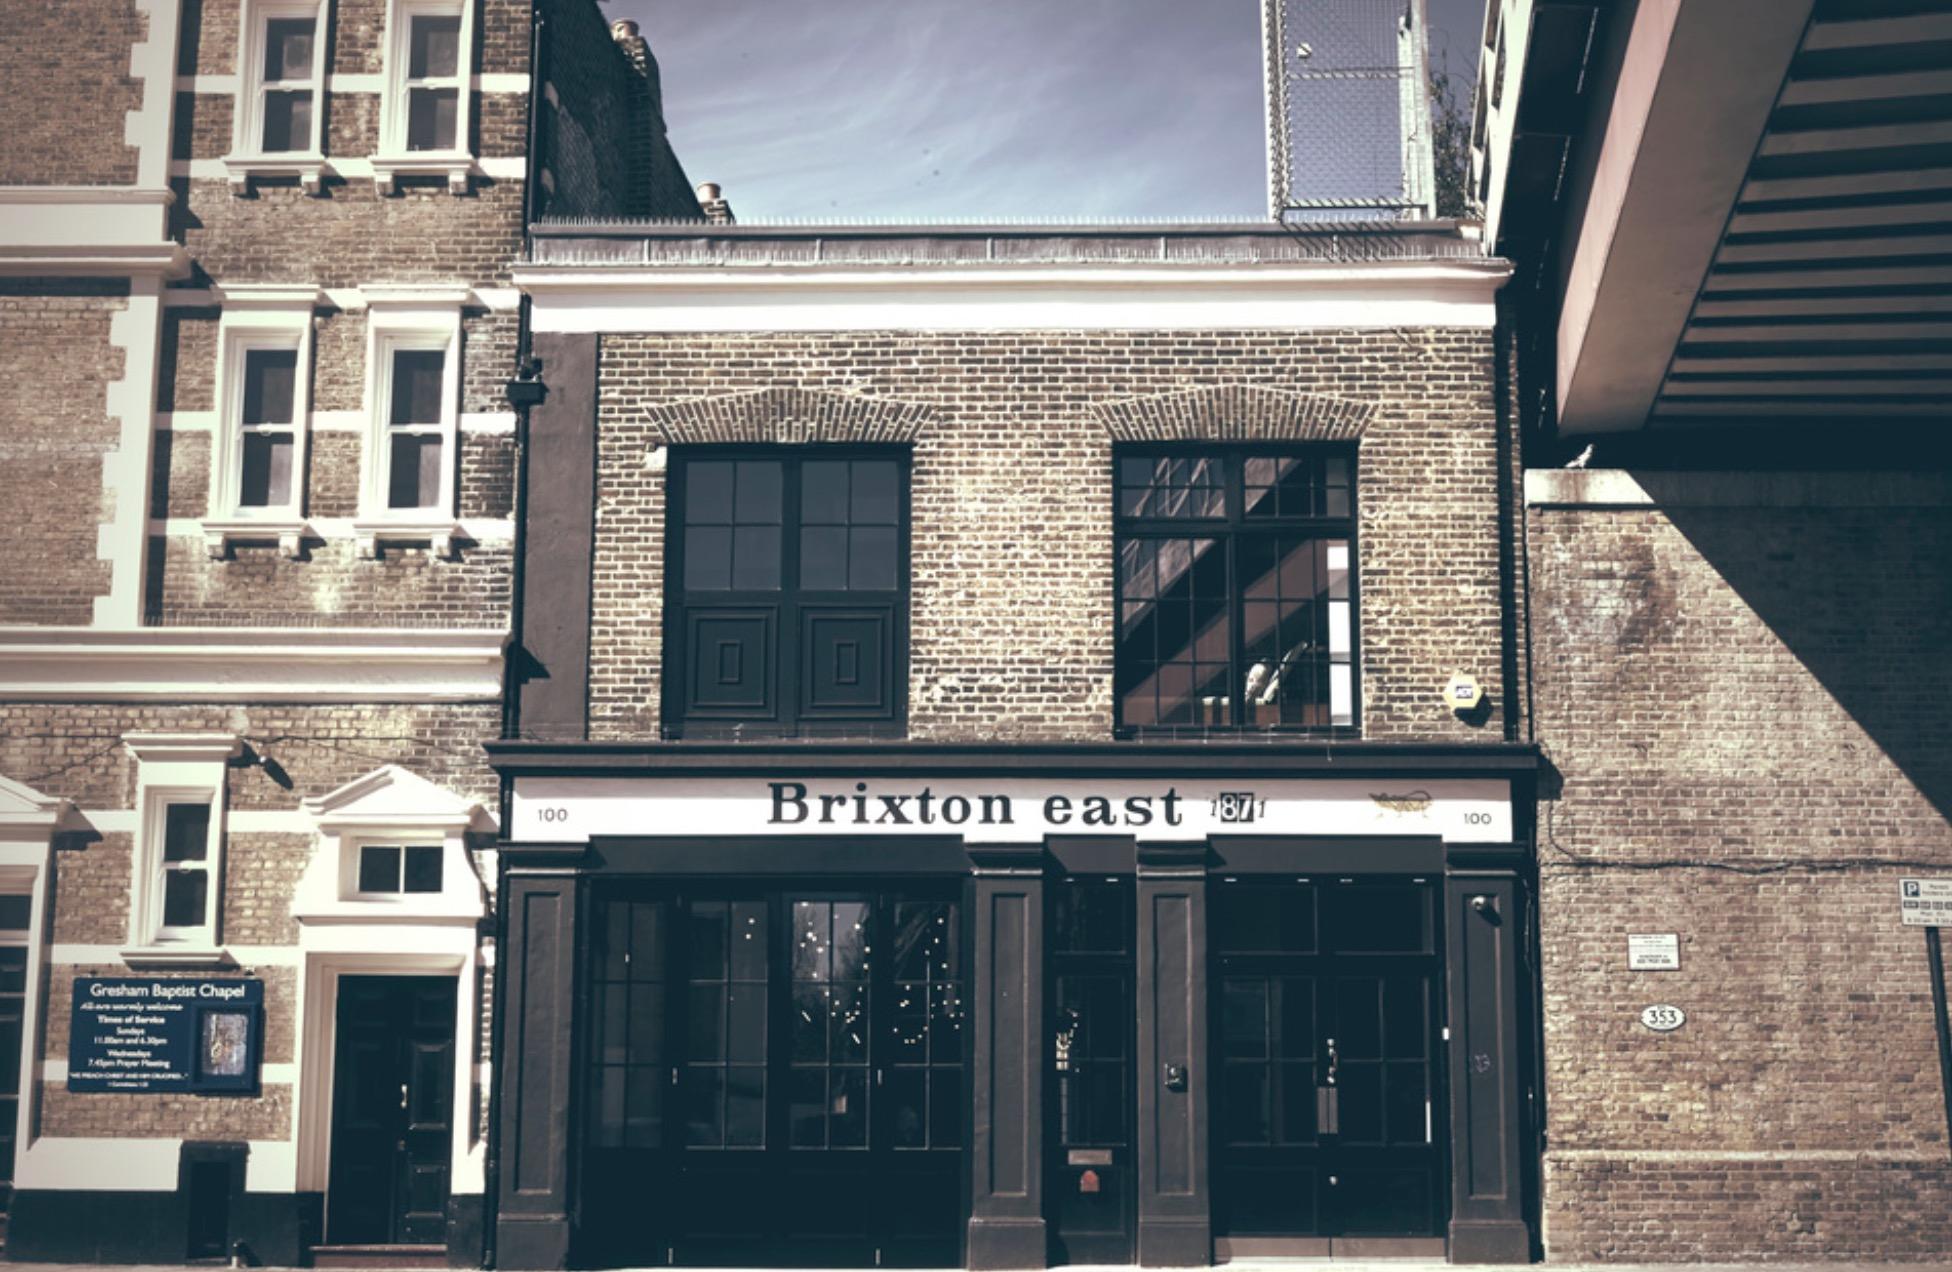 BRIXTON EAST